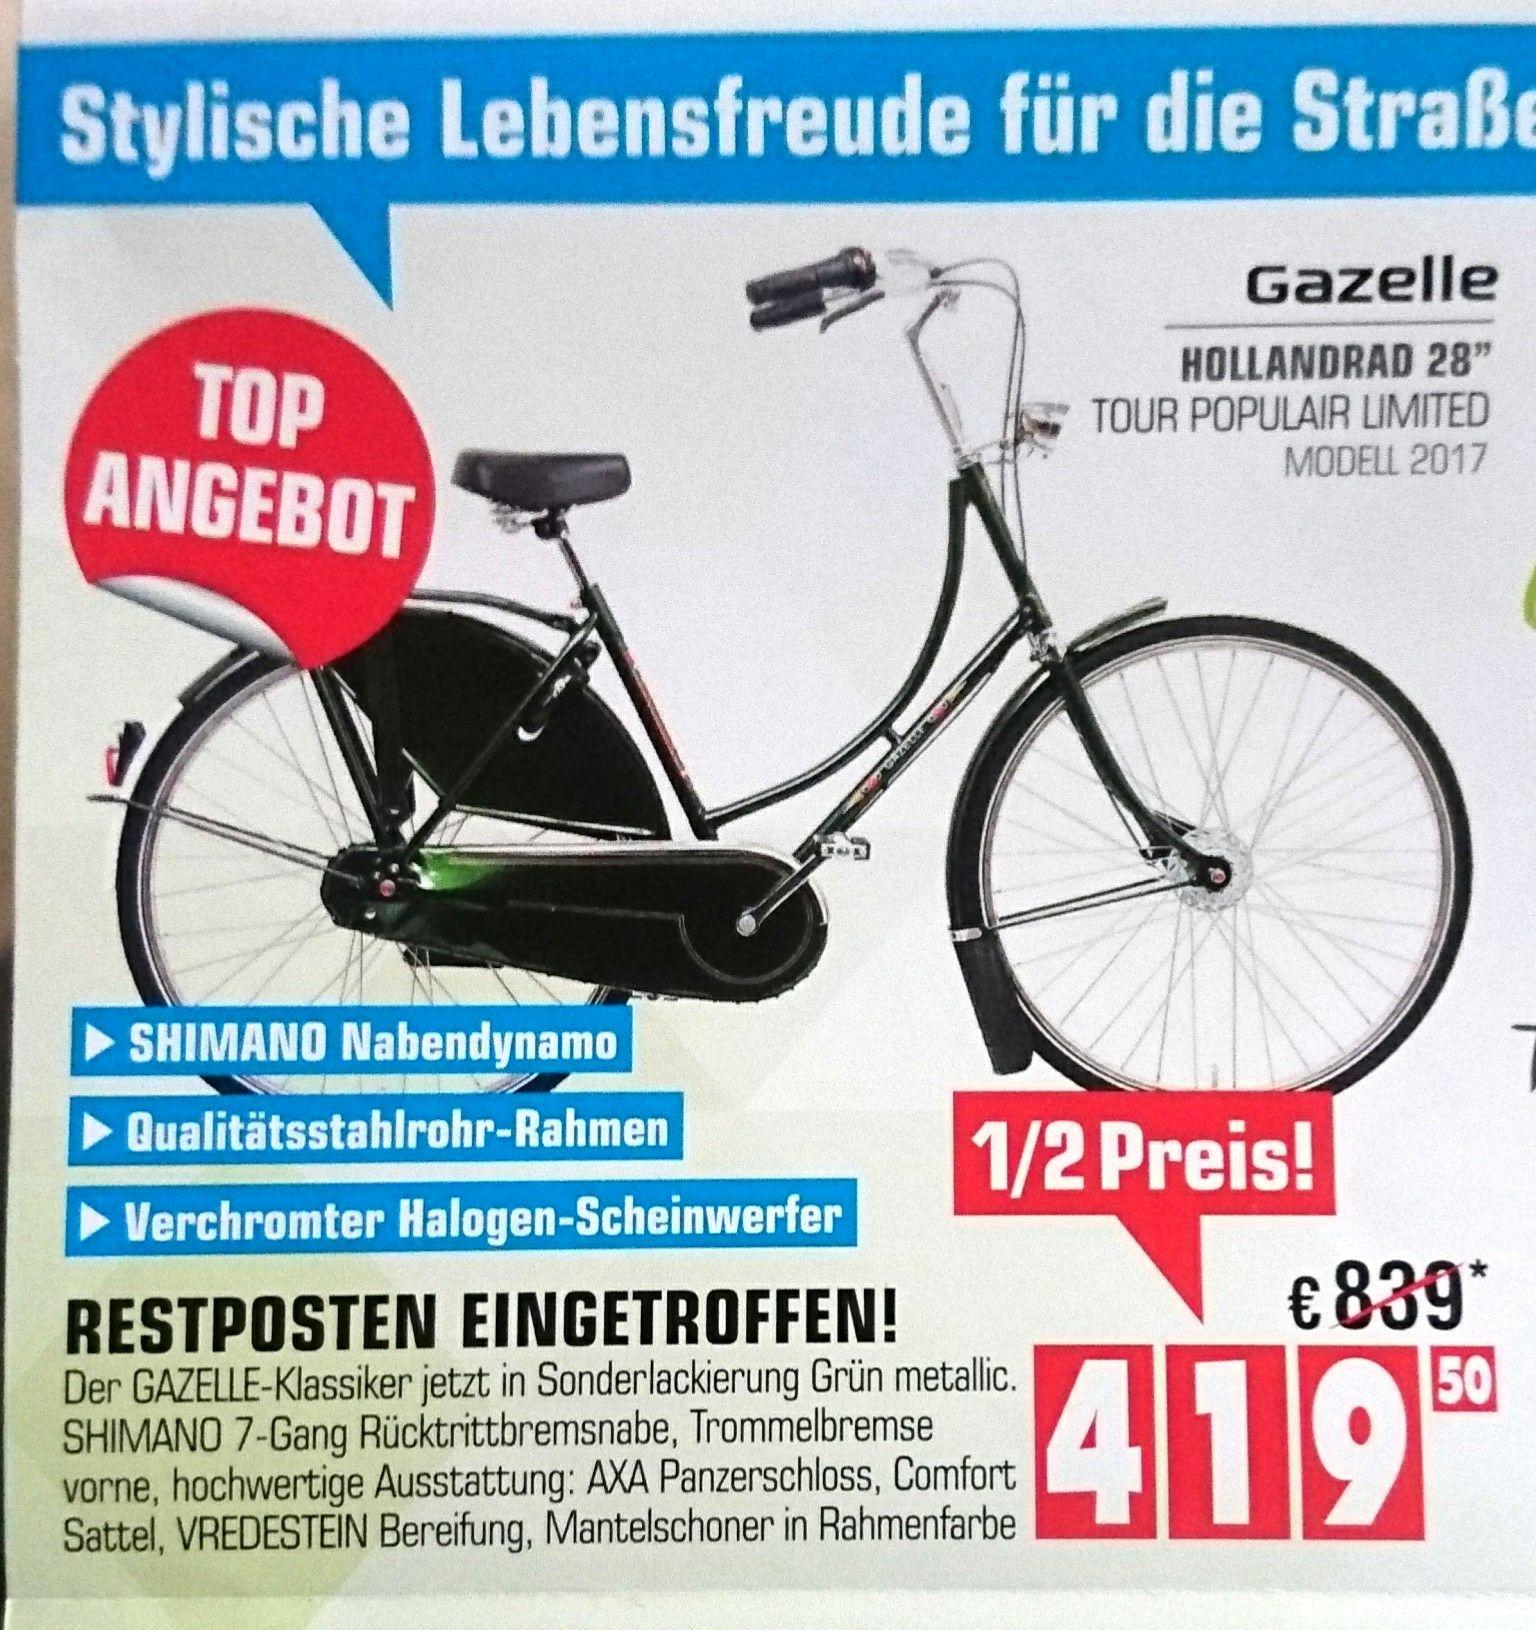 Hollandrad Gazelle Tour Populair Limited 7-Gang Damenrad Fahrrad incl. 2 Geschenke